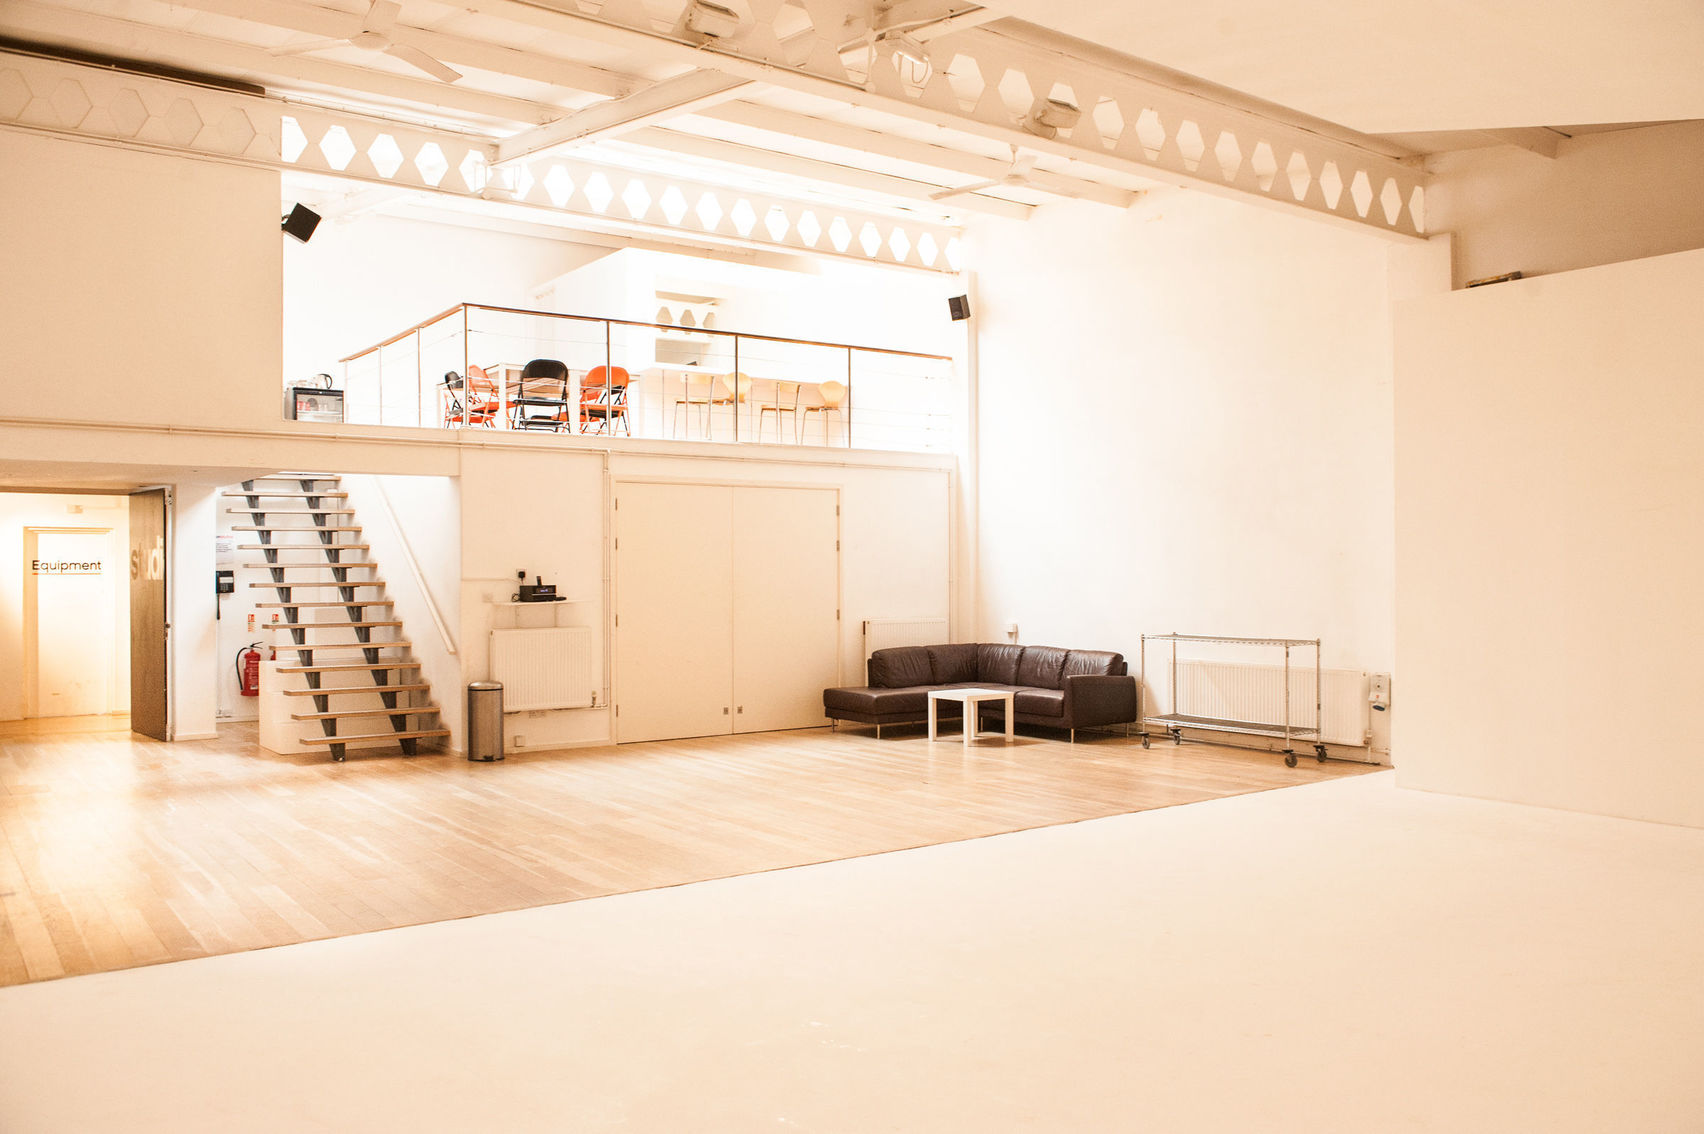 Studio 2, Jet Studios